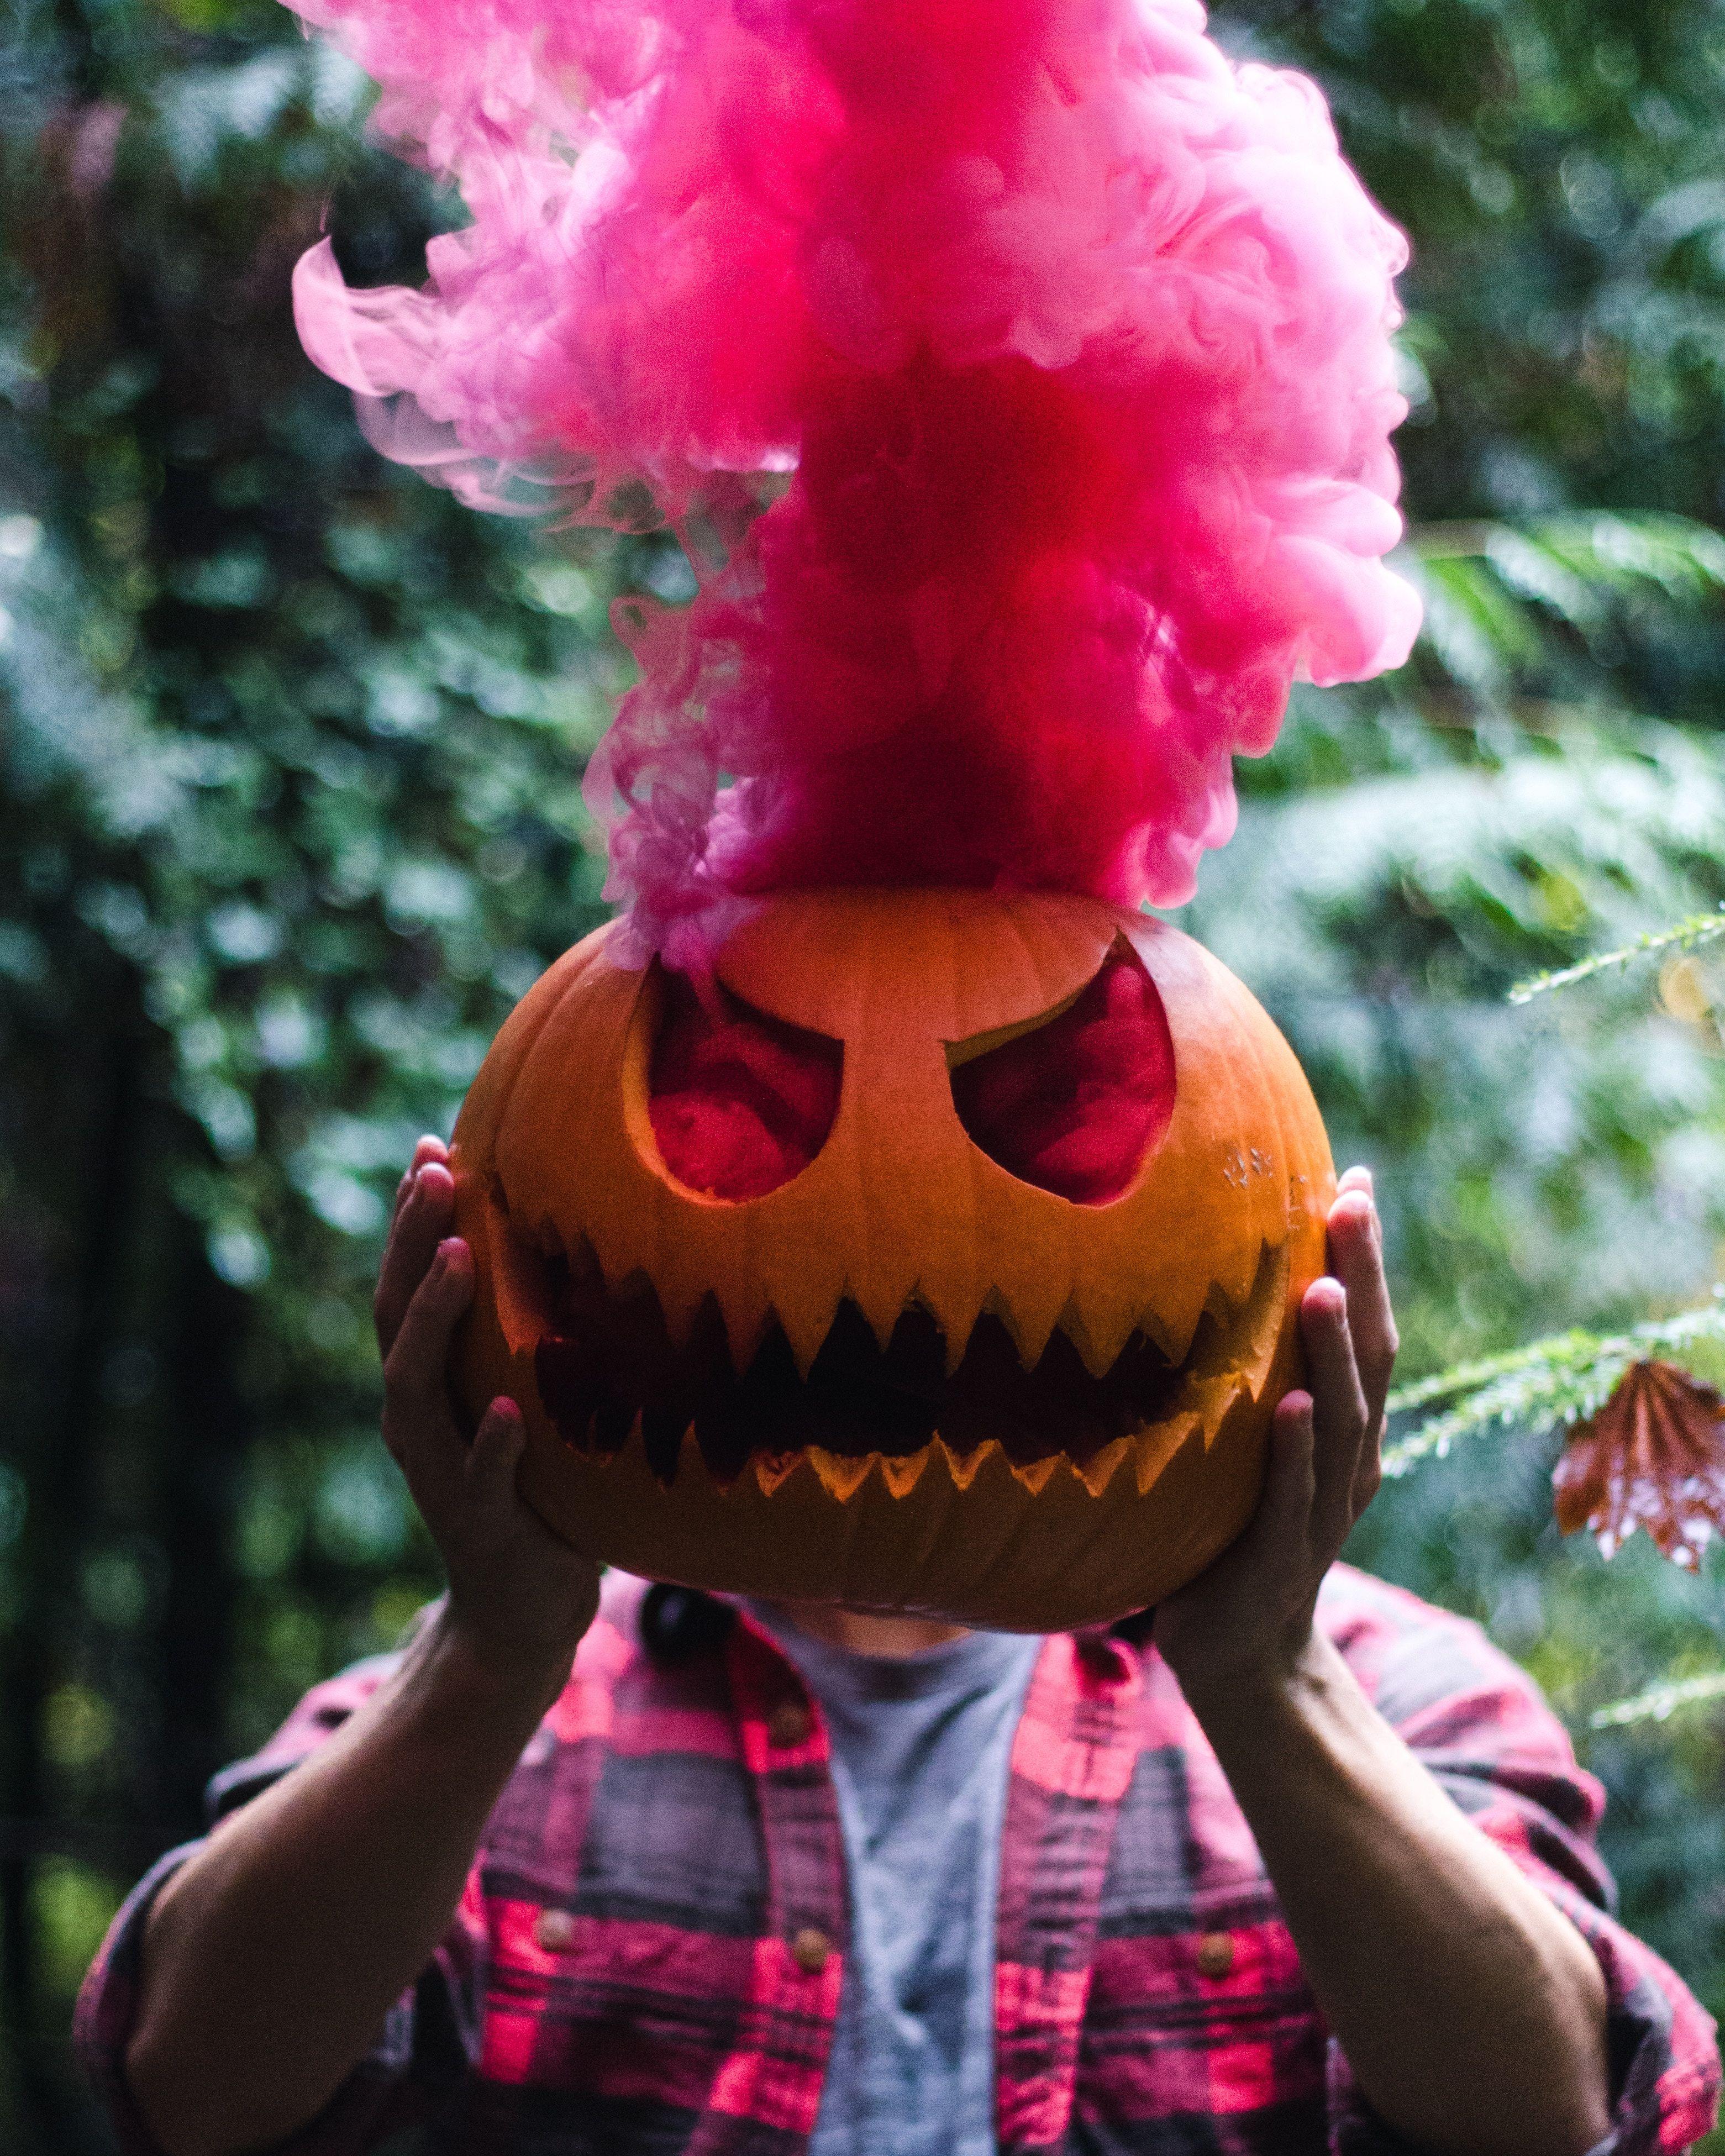 Halloween In Belgie.Halloween Decor Inspiration A Cut Out Pumpkin With Pink